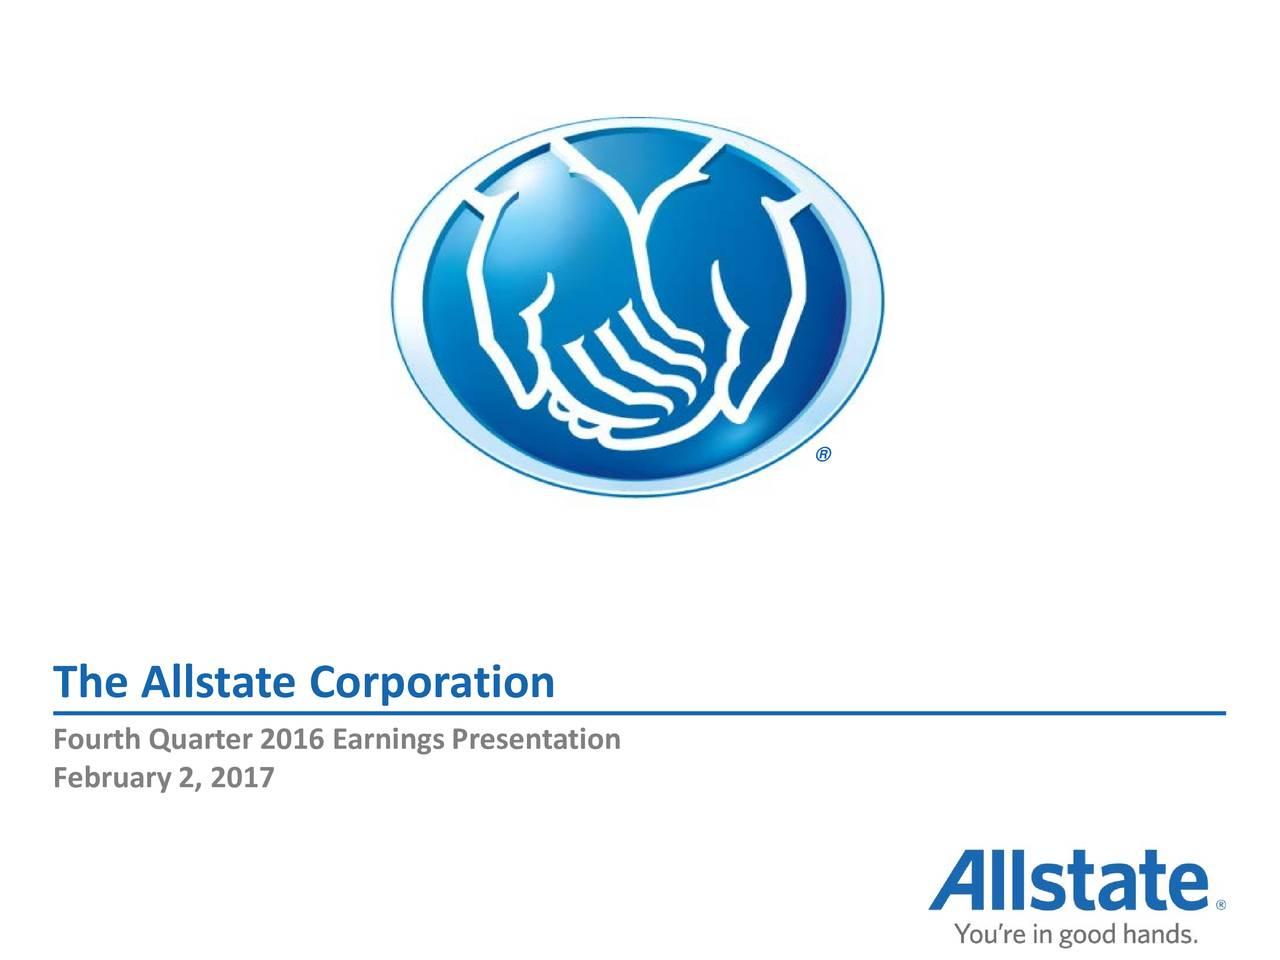 The Allstate Corporation Fourth Quarter 2016 Earnings Presentation February 2, 2017